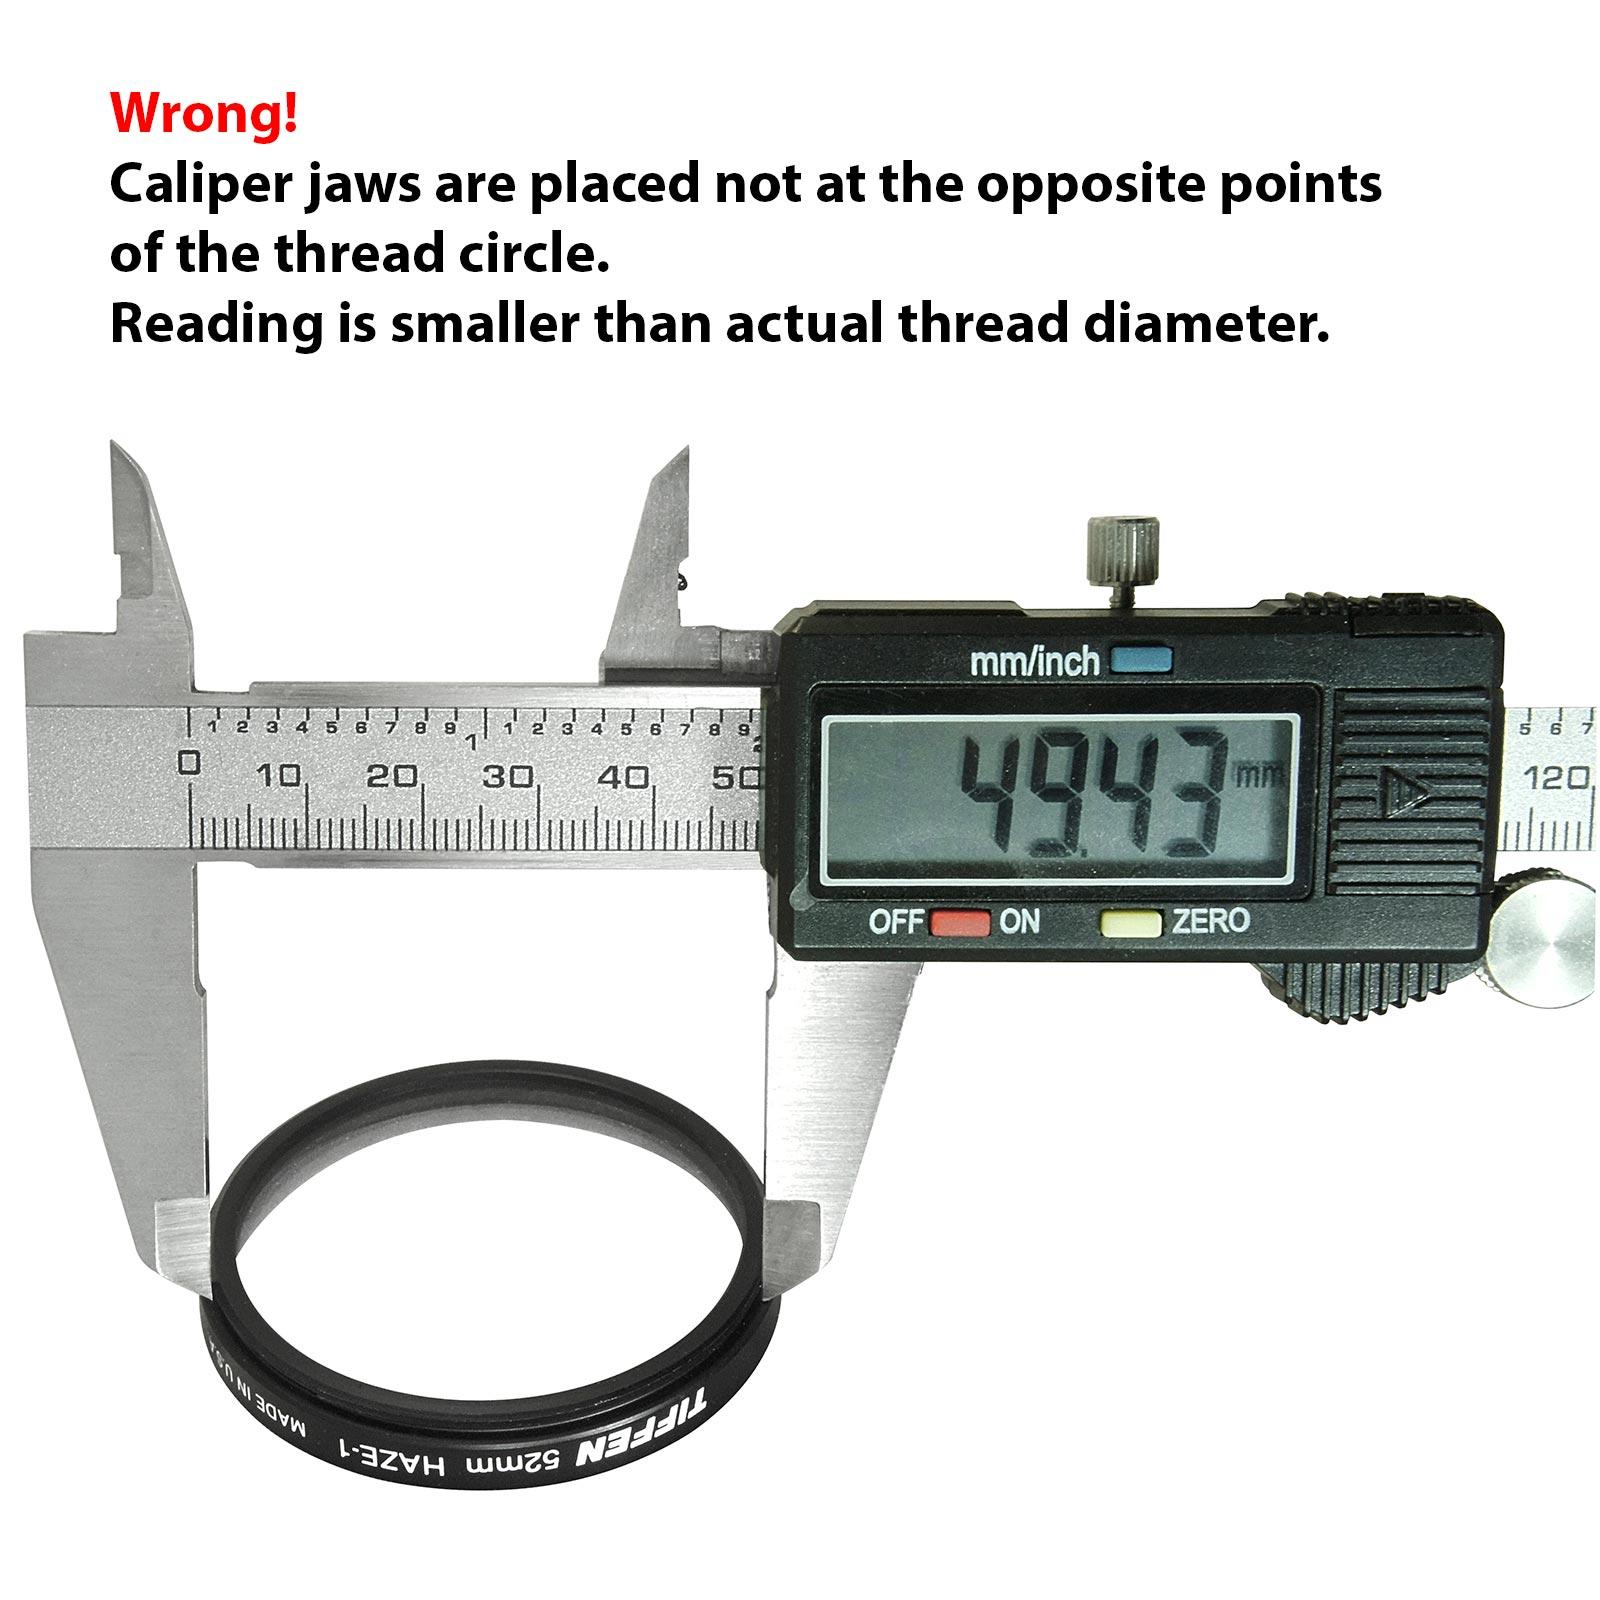 Measuring external thread with digital caliper